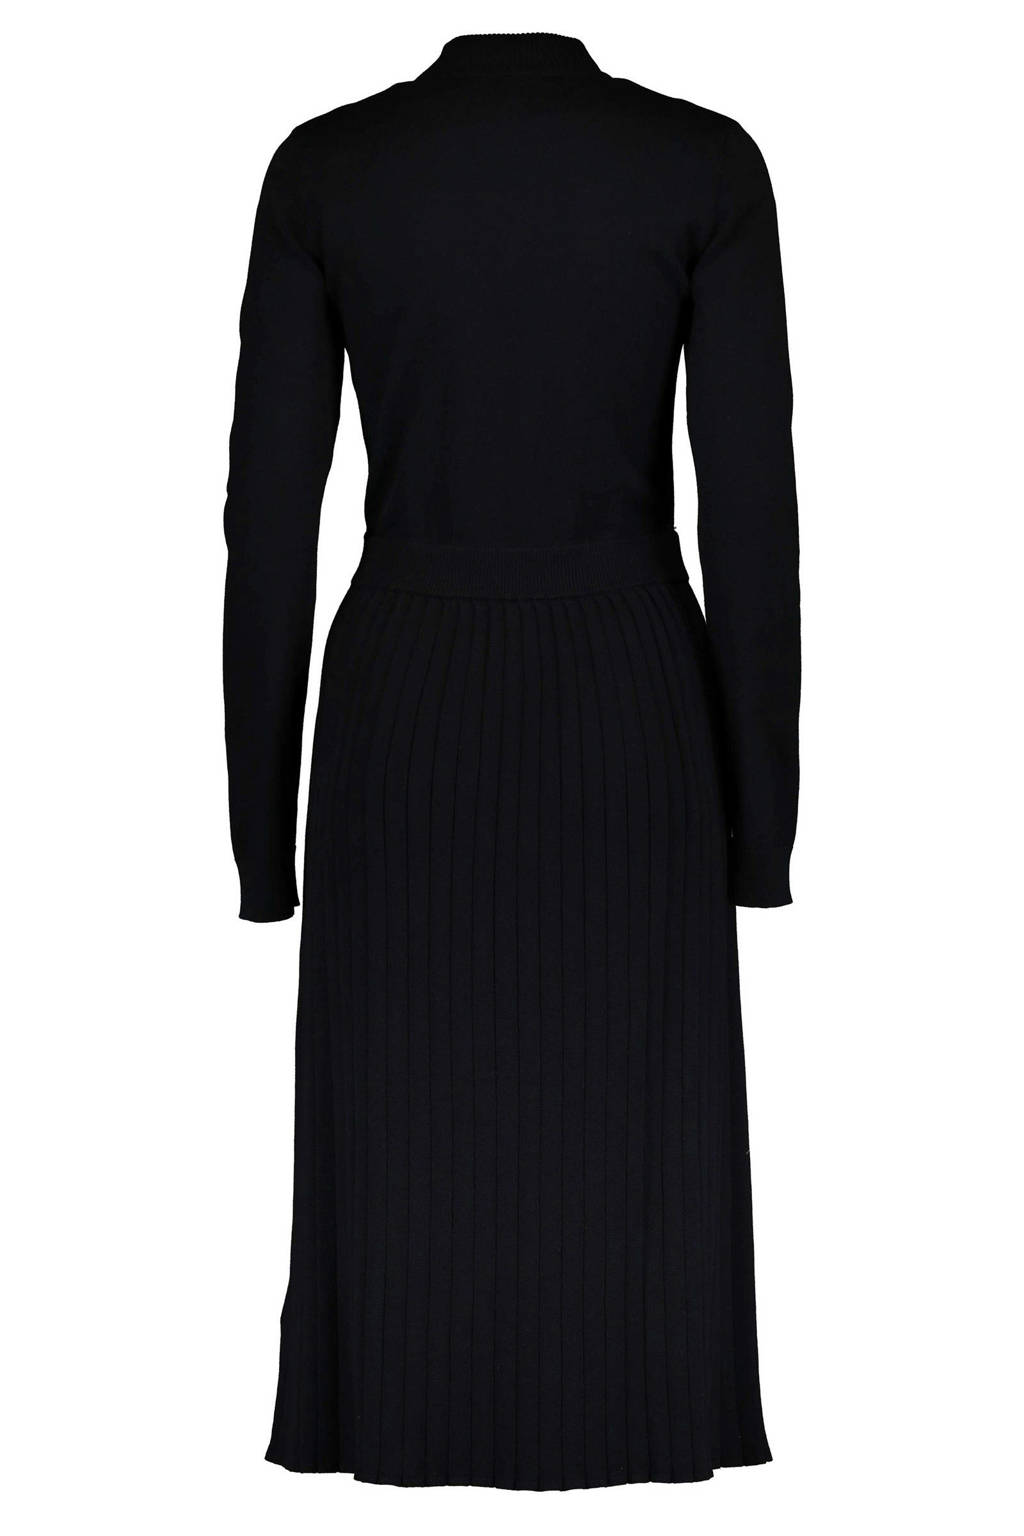 edc Women fijngebreide jurk zwart, Zwart